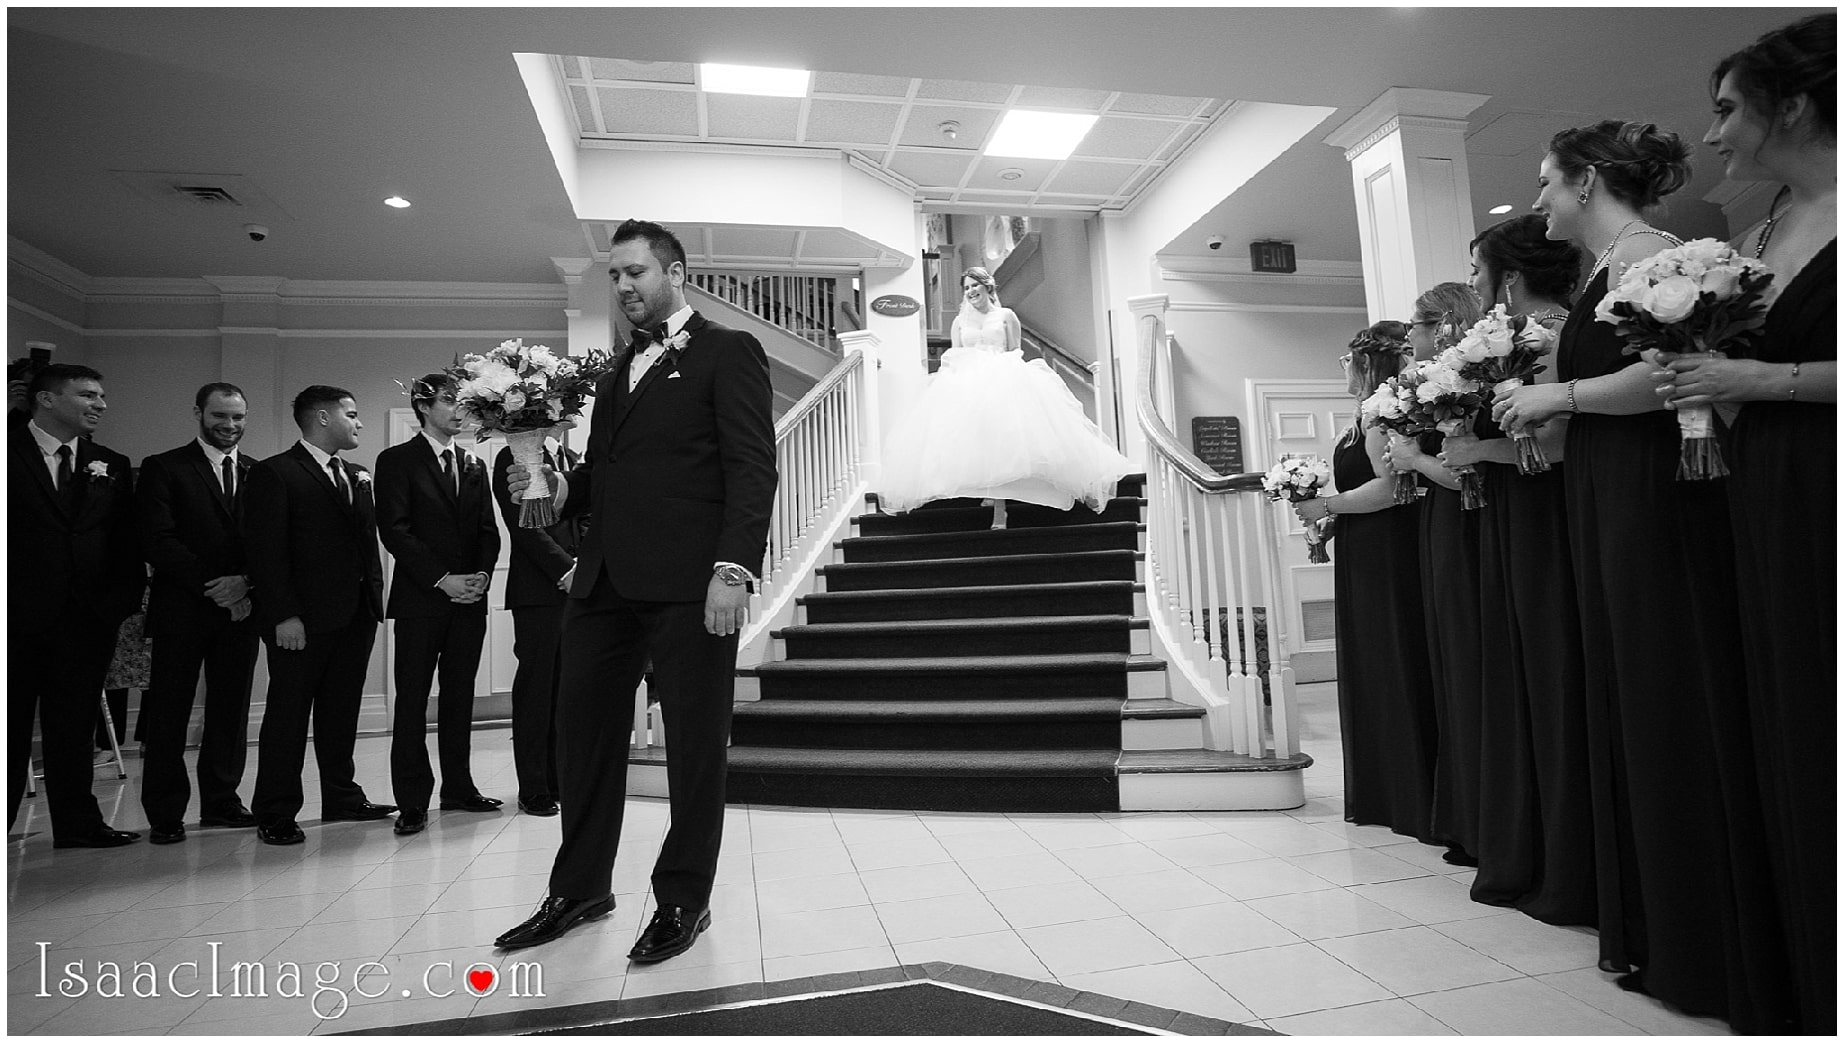 Queens Landing Hotel Wedding Niagara On The Lake Ian and Sasha_0785.jpg